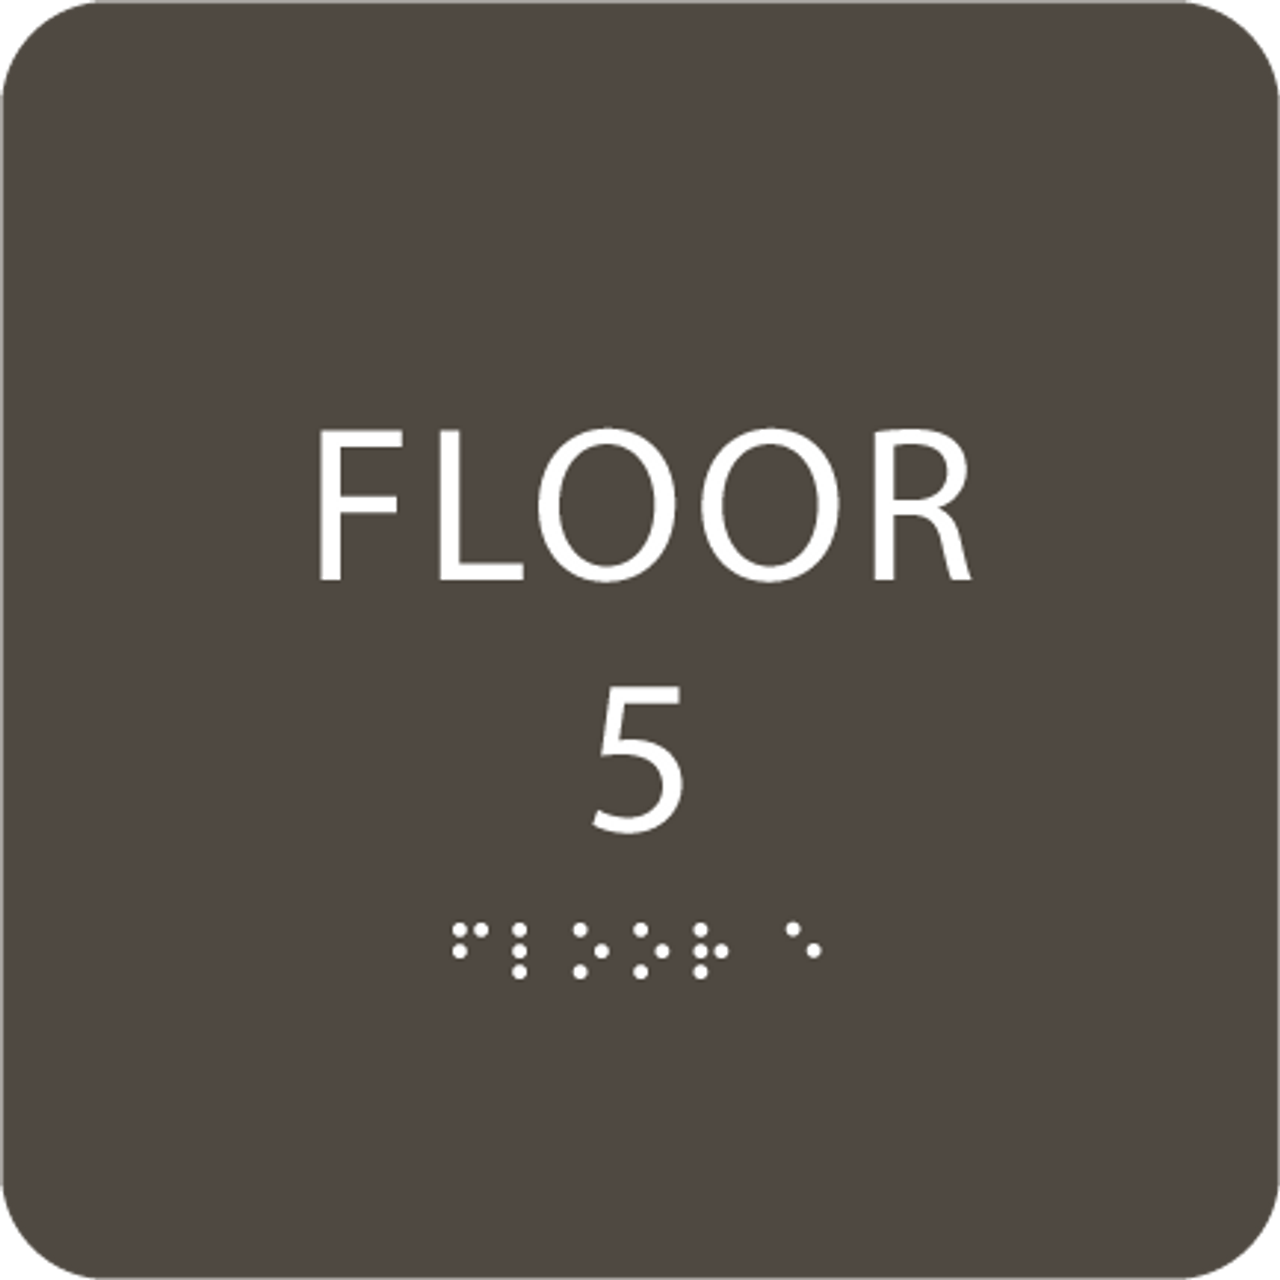 Olive Floor 5 Level Identification Sign